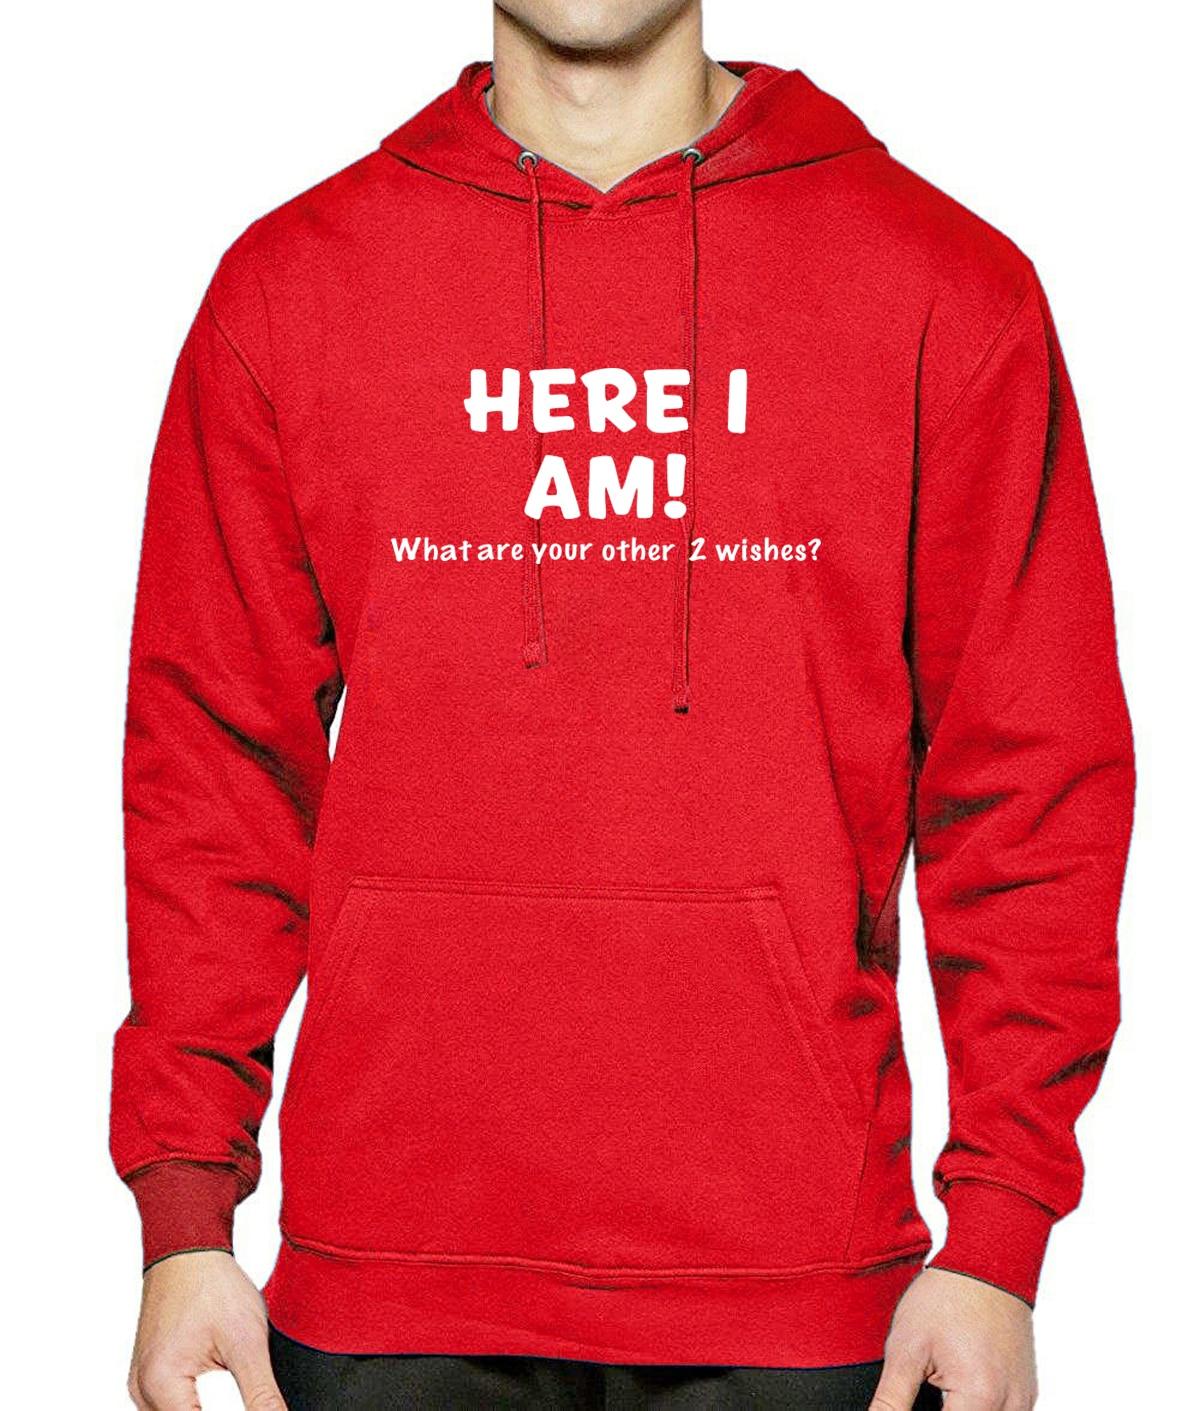 HERE I AM Letter Print Sweatshirts For Men Hoody 2017 Spring Winter Mens Hoodies Fleece Warm Crossfit Kpop Sportswear Hoodie Hot